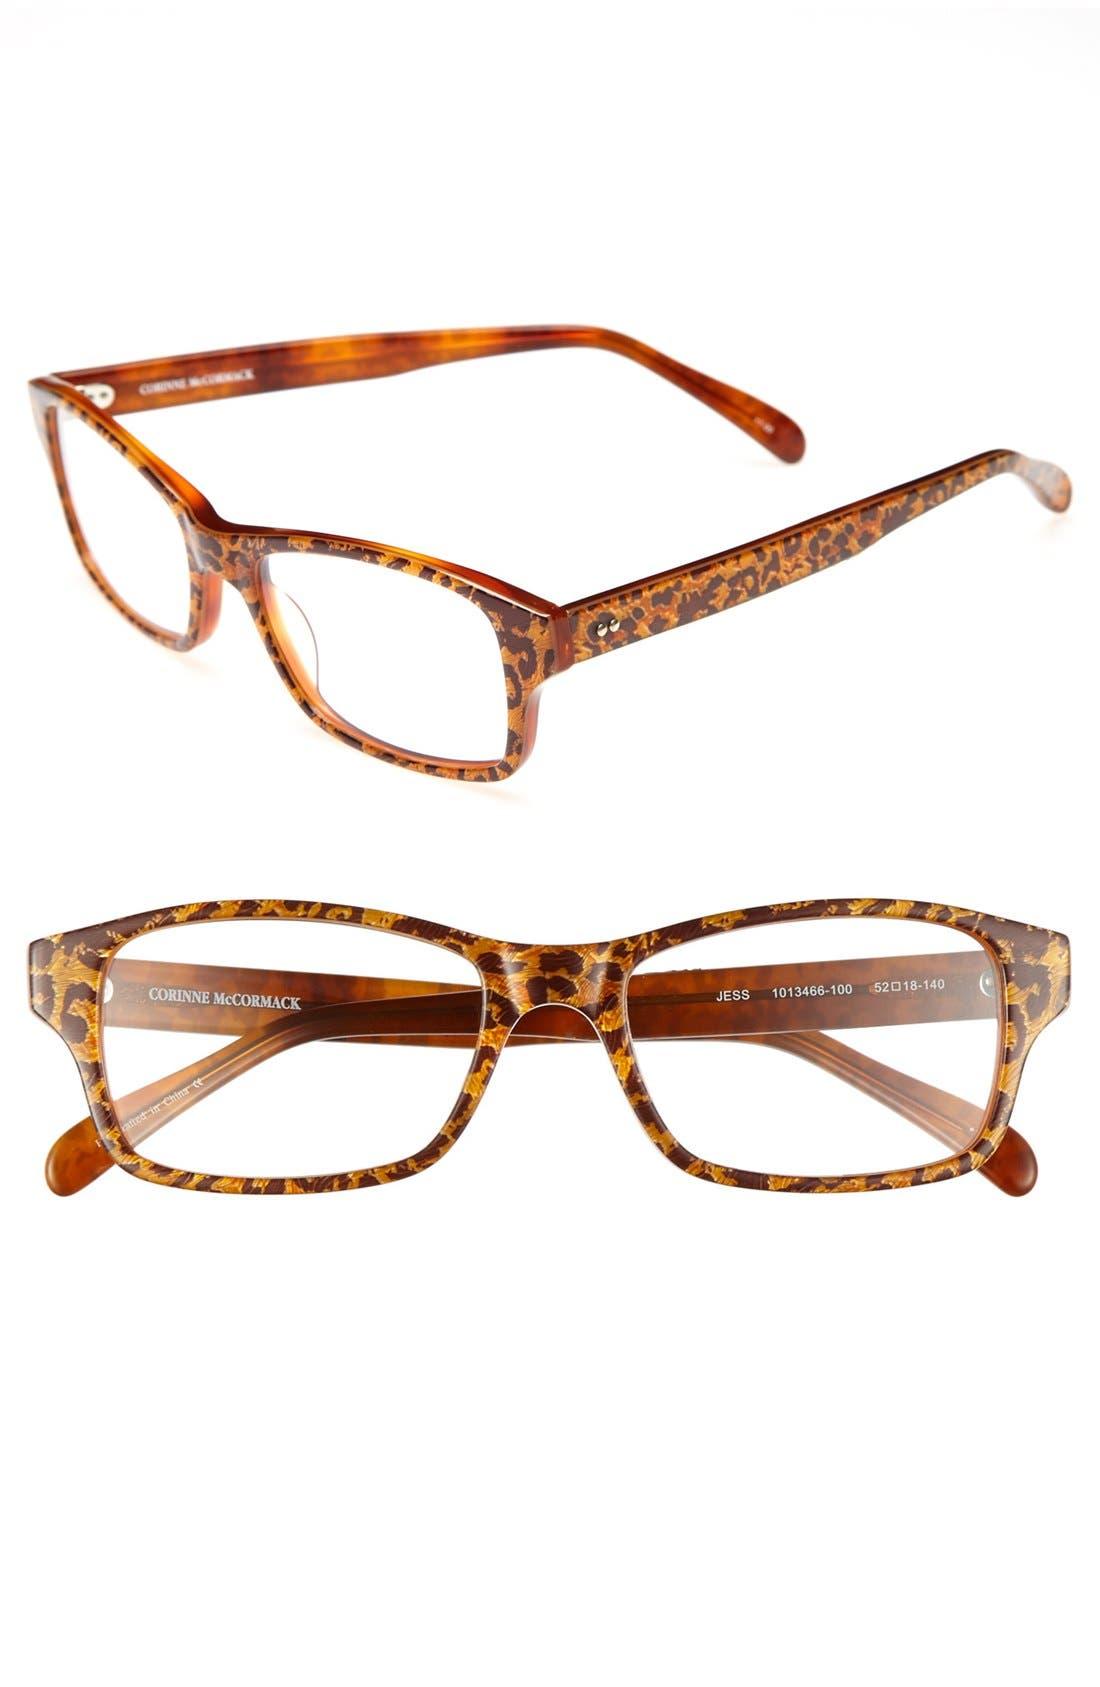 Main Image - Corinne McCormack 'Jess' 52mm Reading Glasses